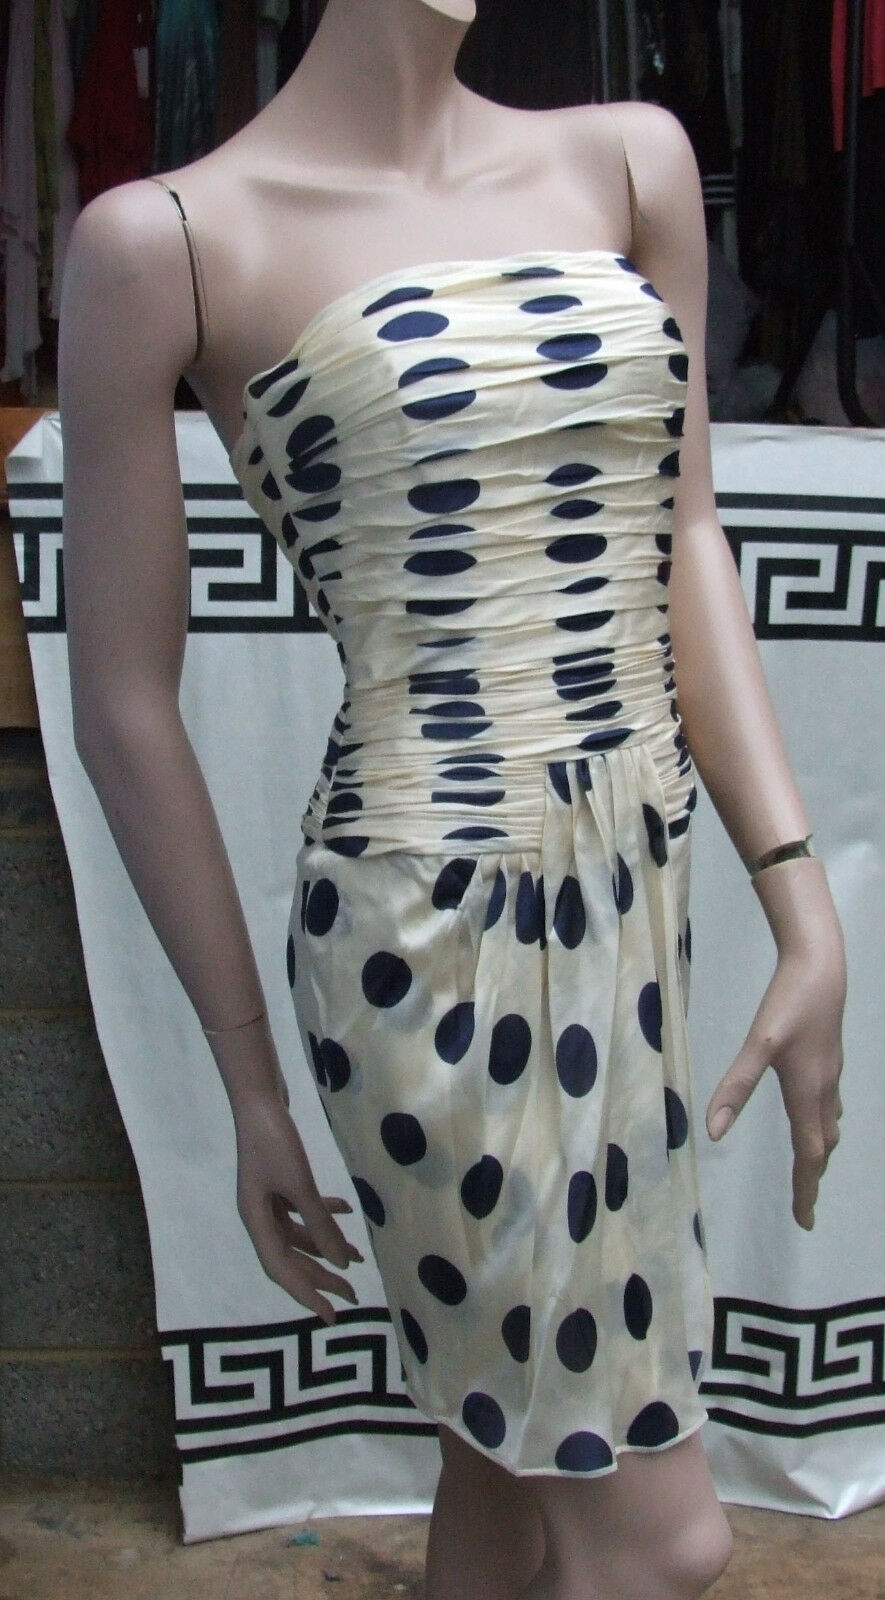 Delightful Cream Silk with Navy Blau Polka Dot Evening Eve Dress XS 6-8